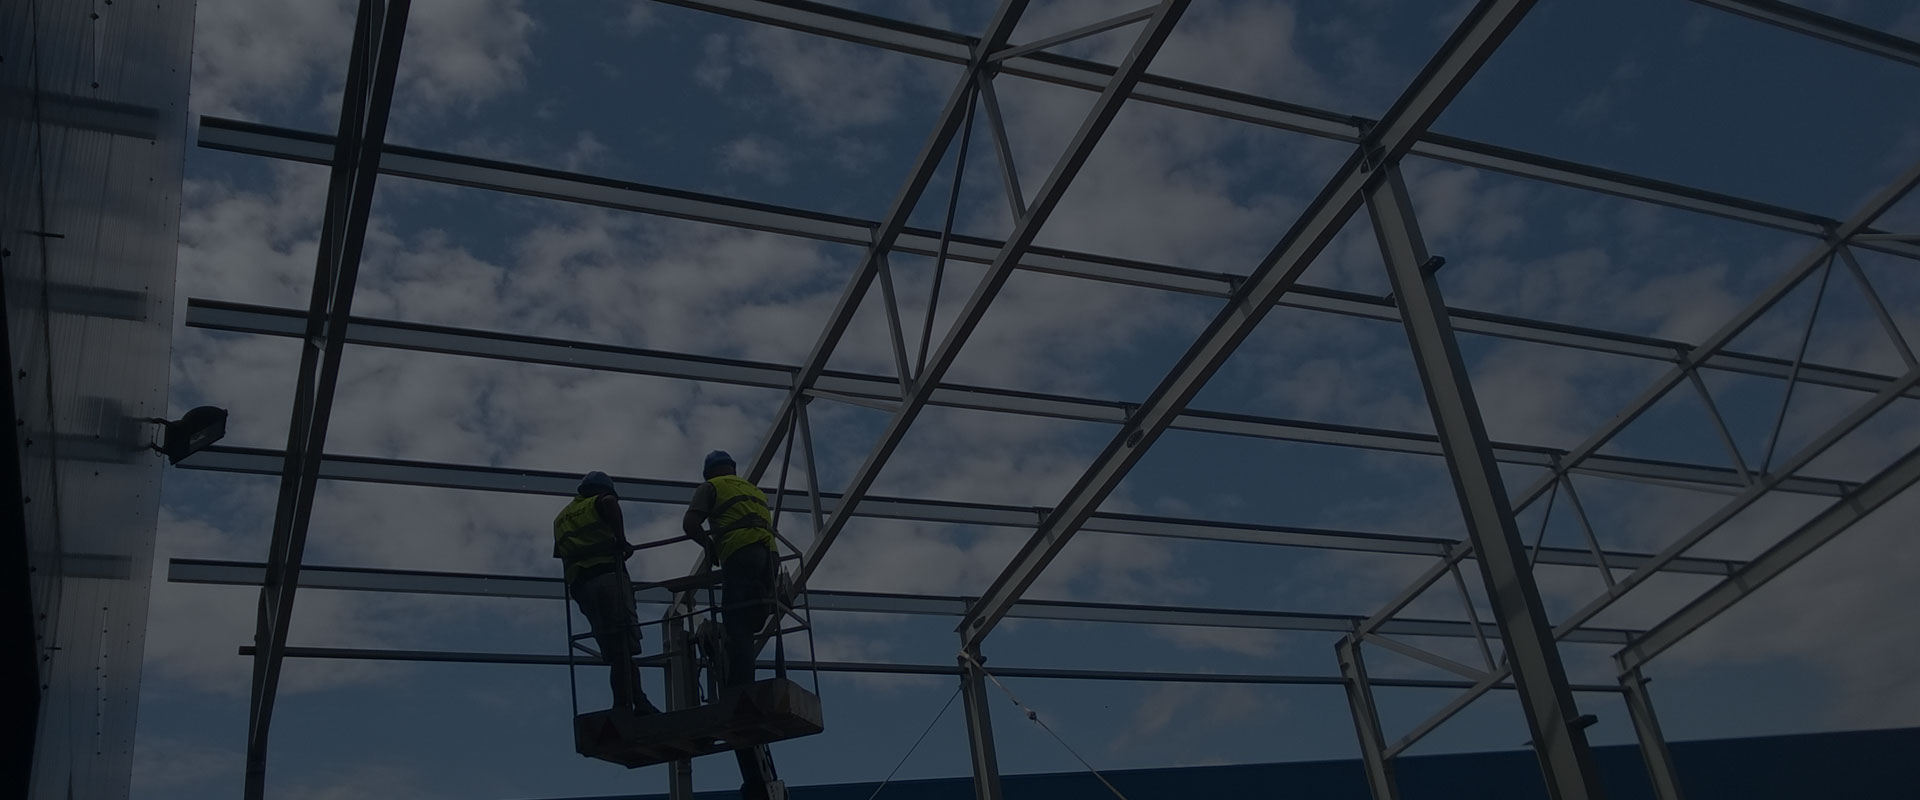 konstrukcje-stalowe